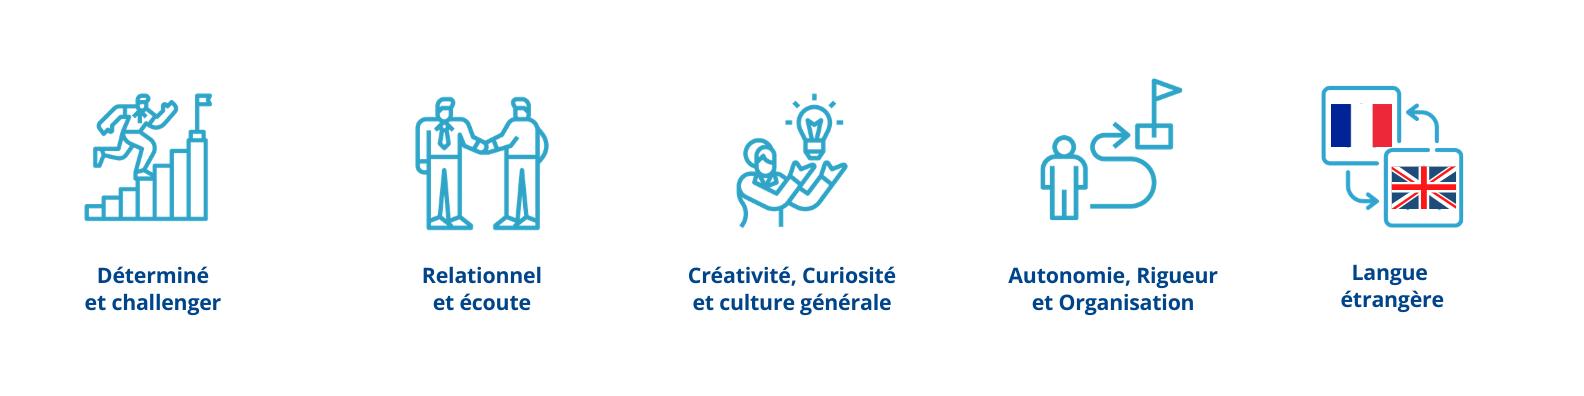 euridis-ecole-de-commerce-vente-marketing-page-metier-business-developer-metiers-vente1